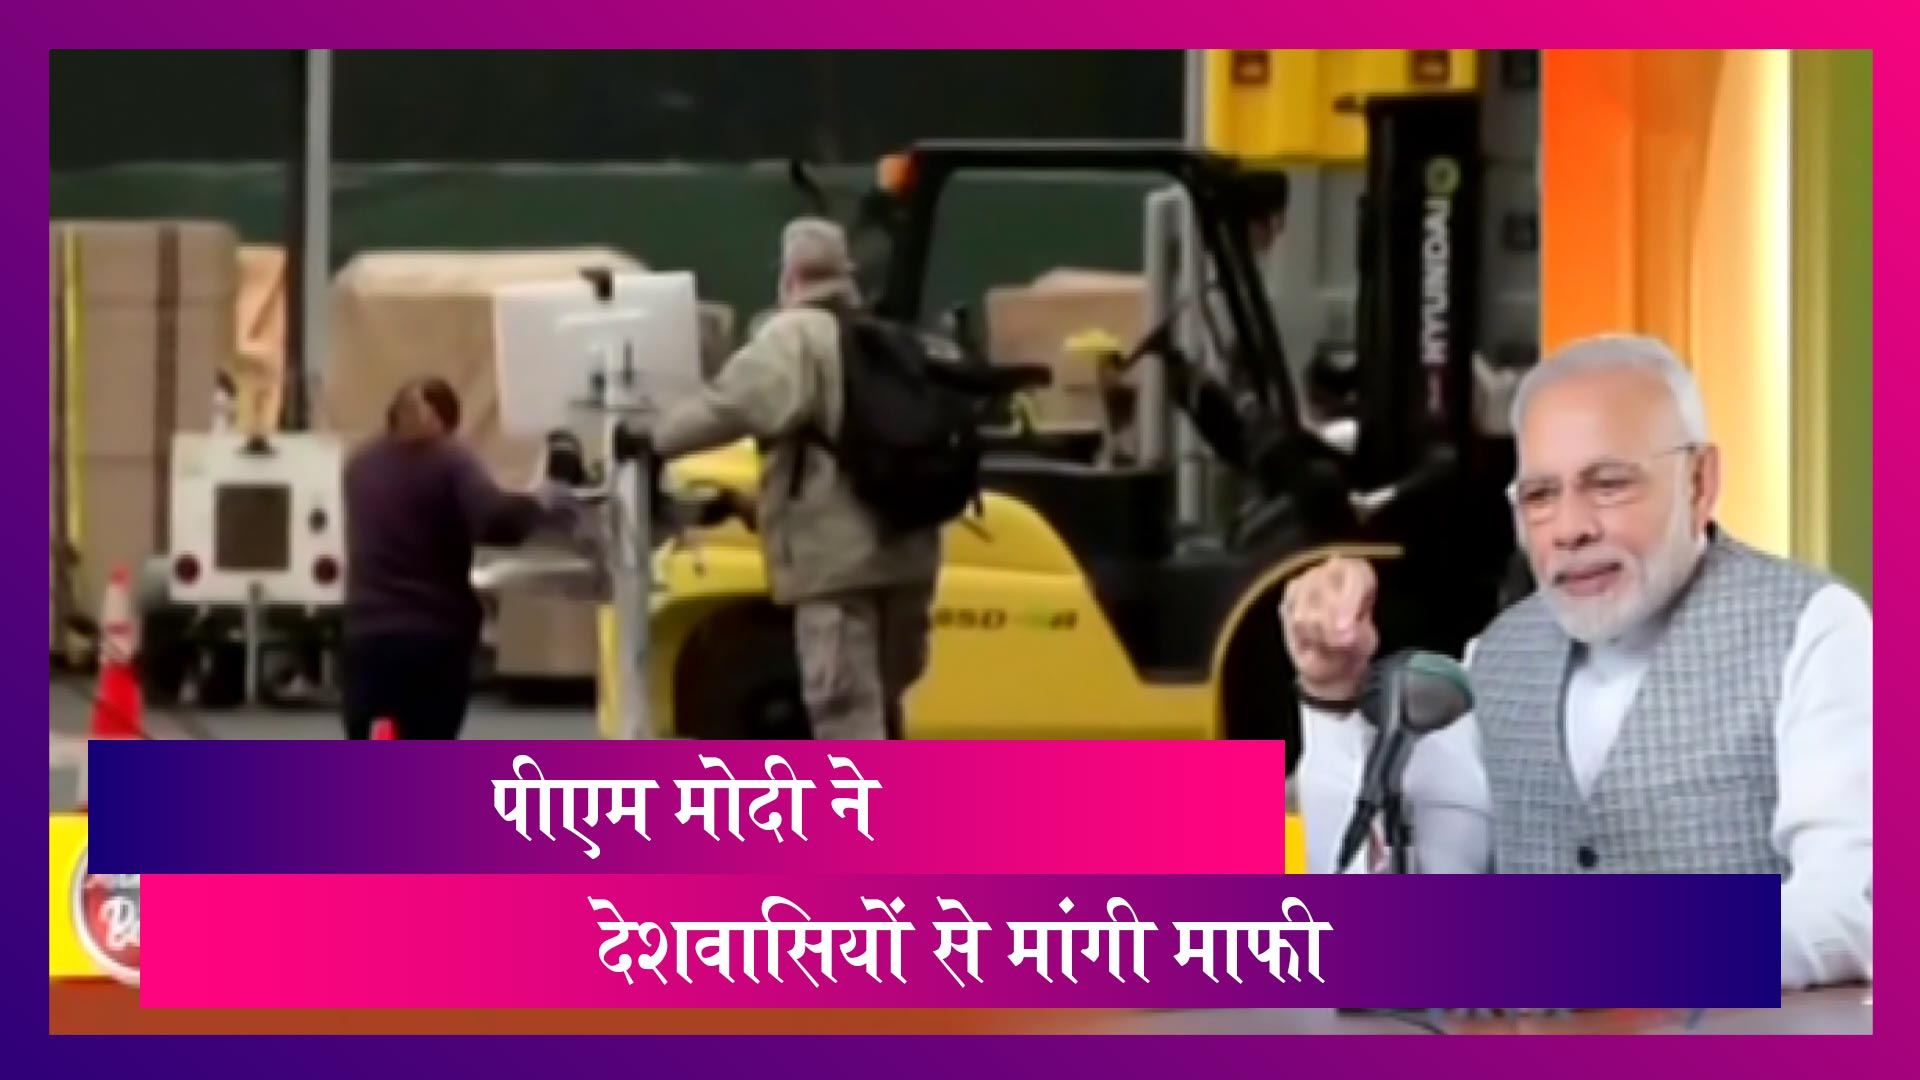 Prime Minister Narendra Modi apologises For 'Hardship' due to lockdown during Mann Ki Baat